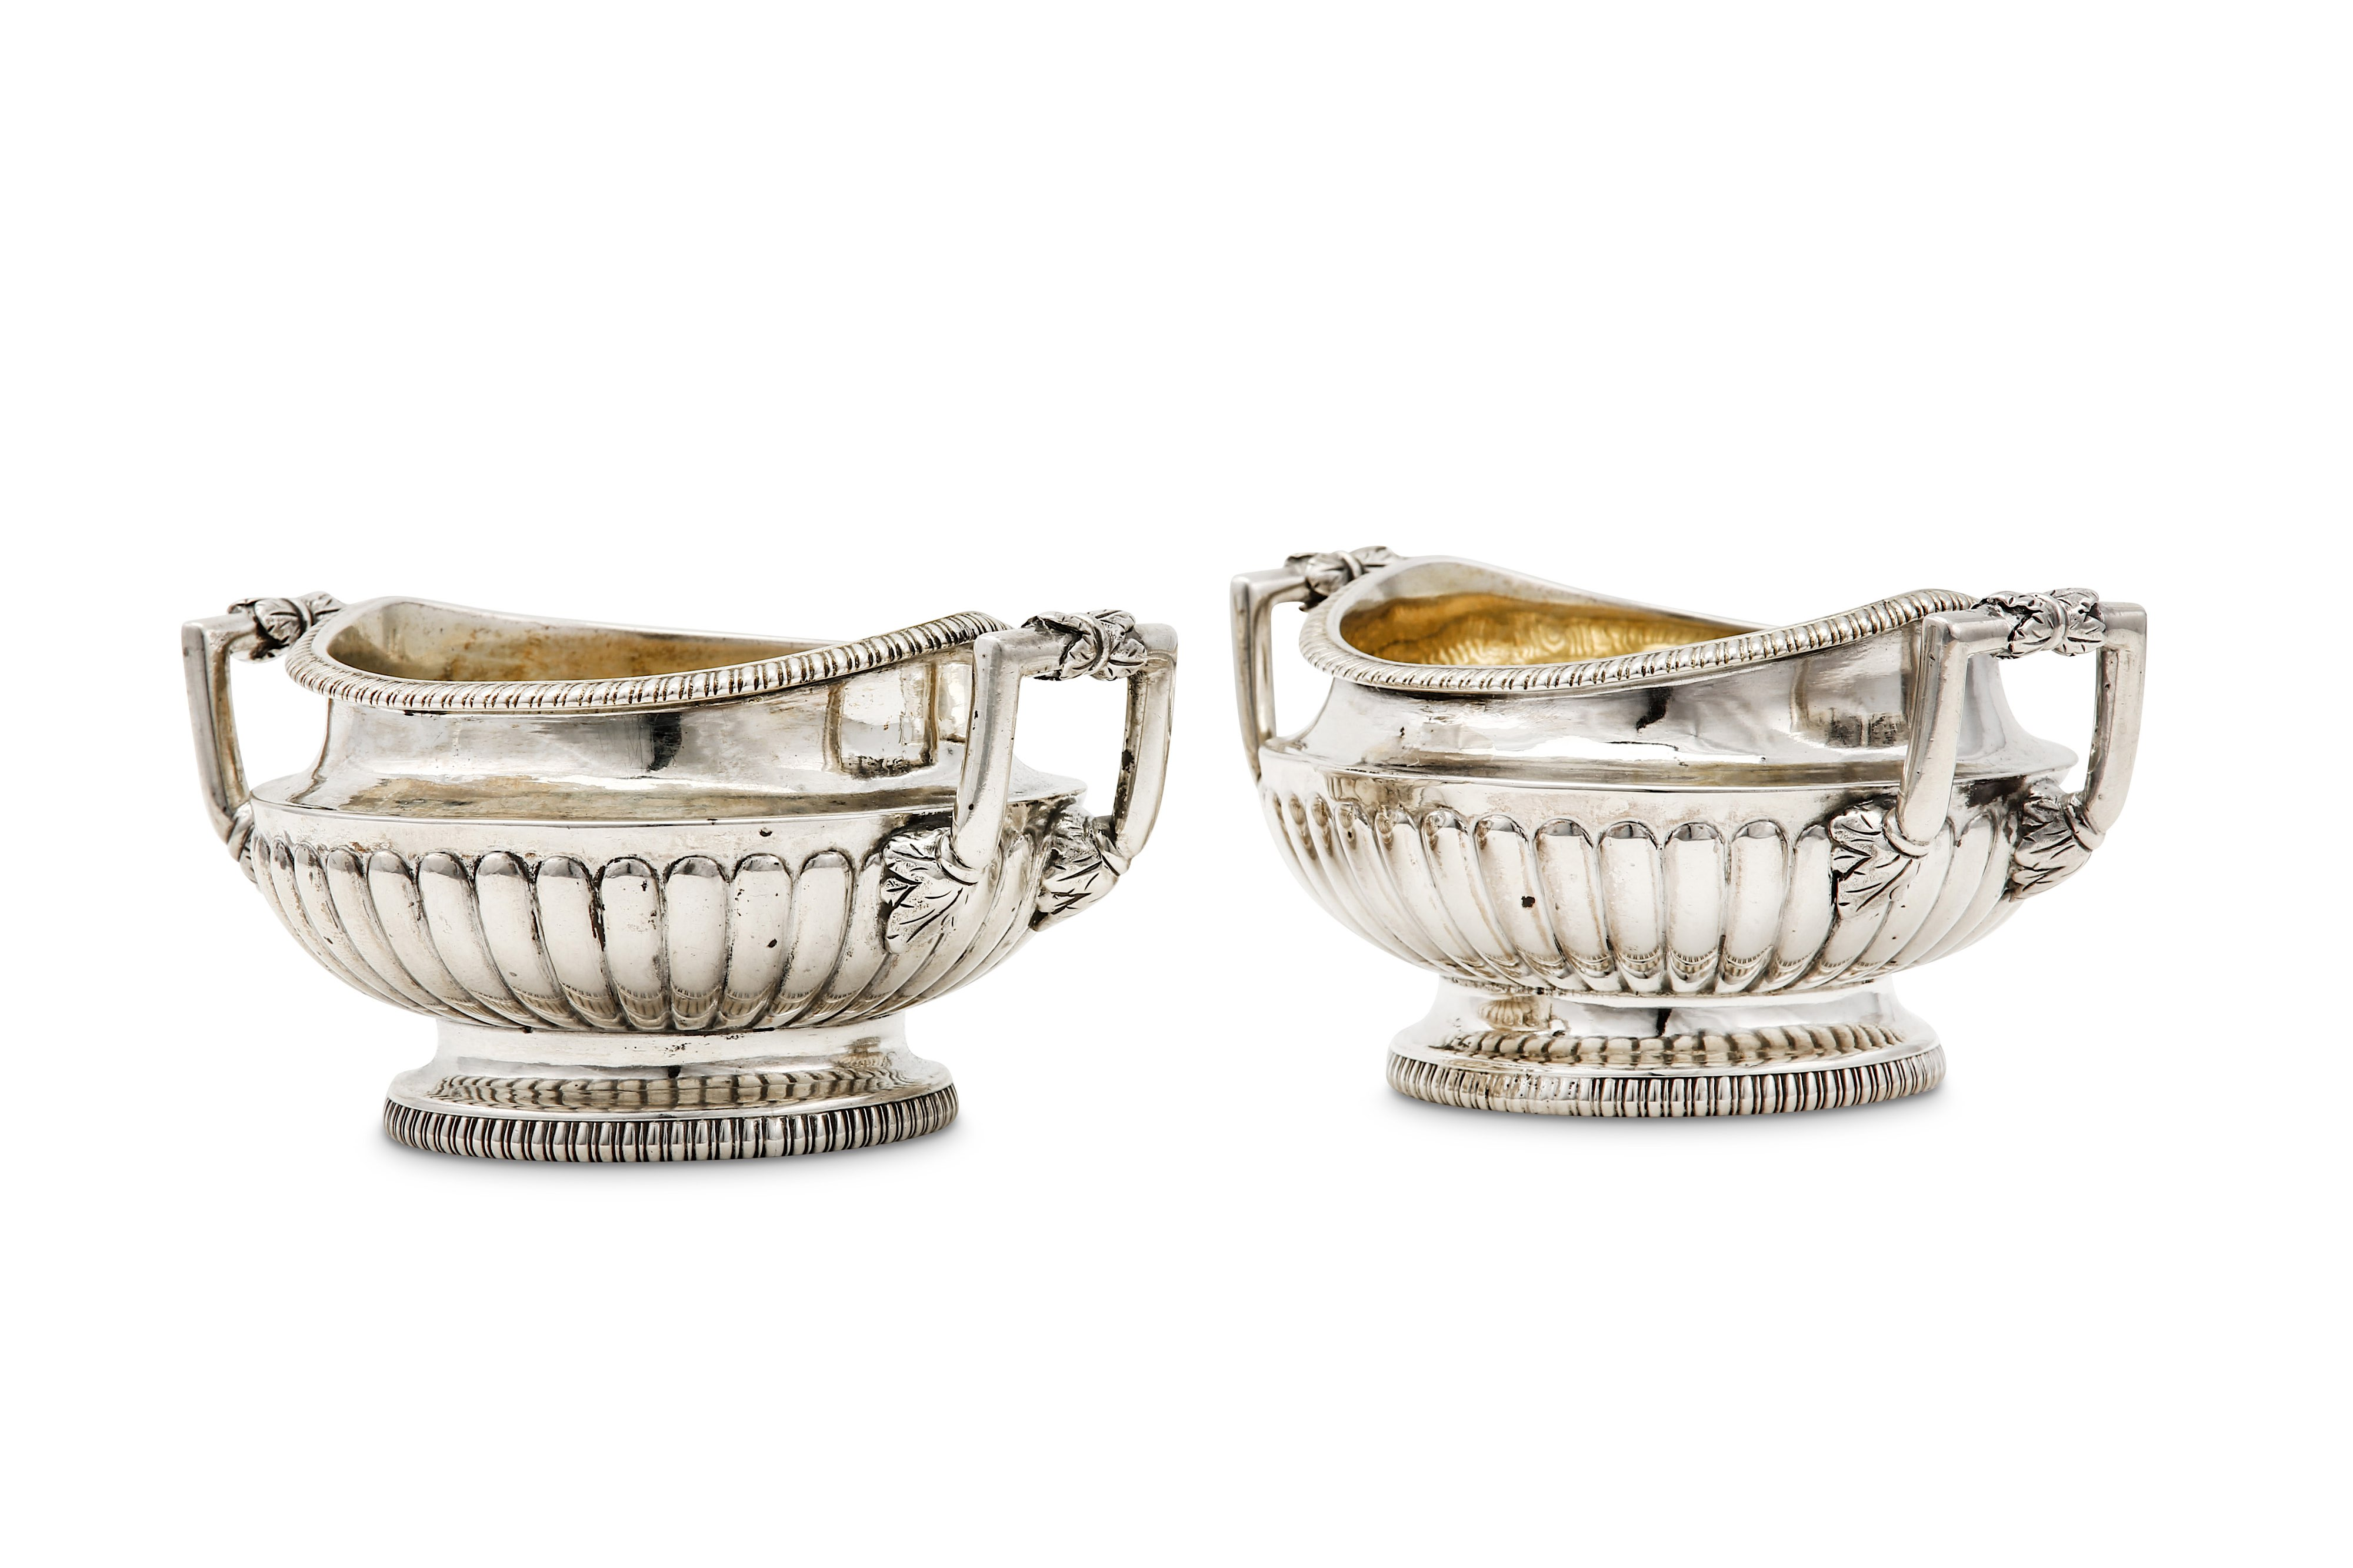 Lot 34 - A pair of George III sterling silver twin handled salts, London 1806 by Daniel Pontifex (reg. Sep 17